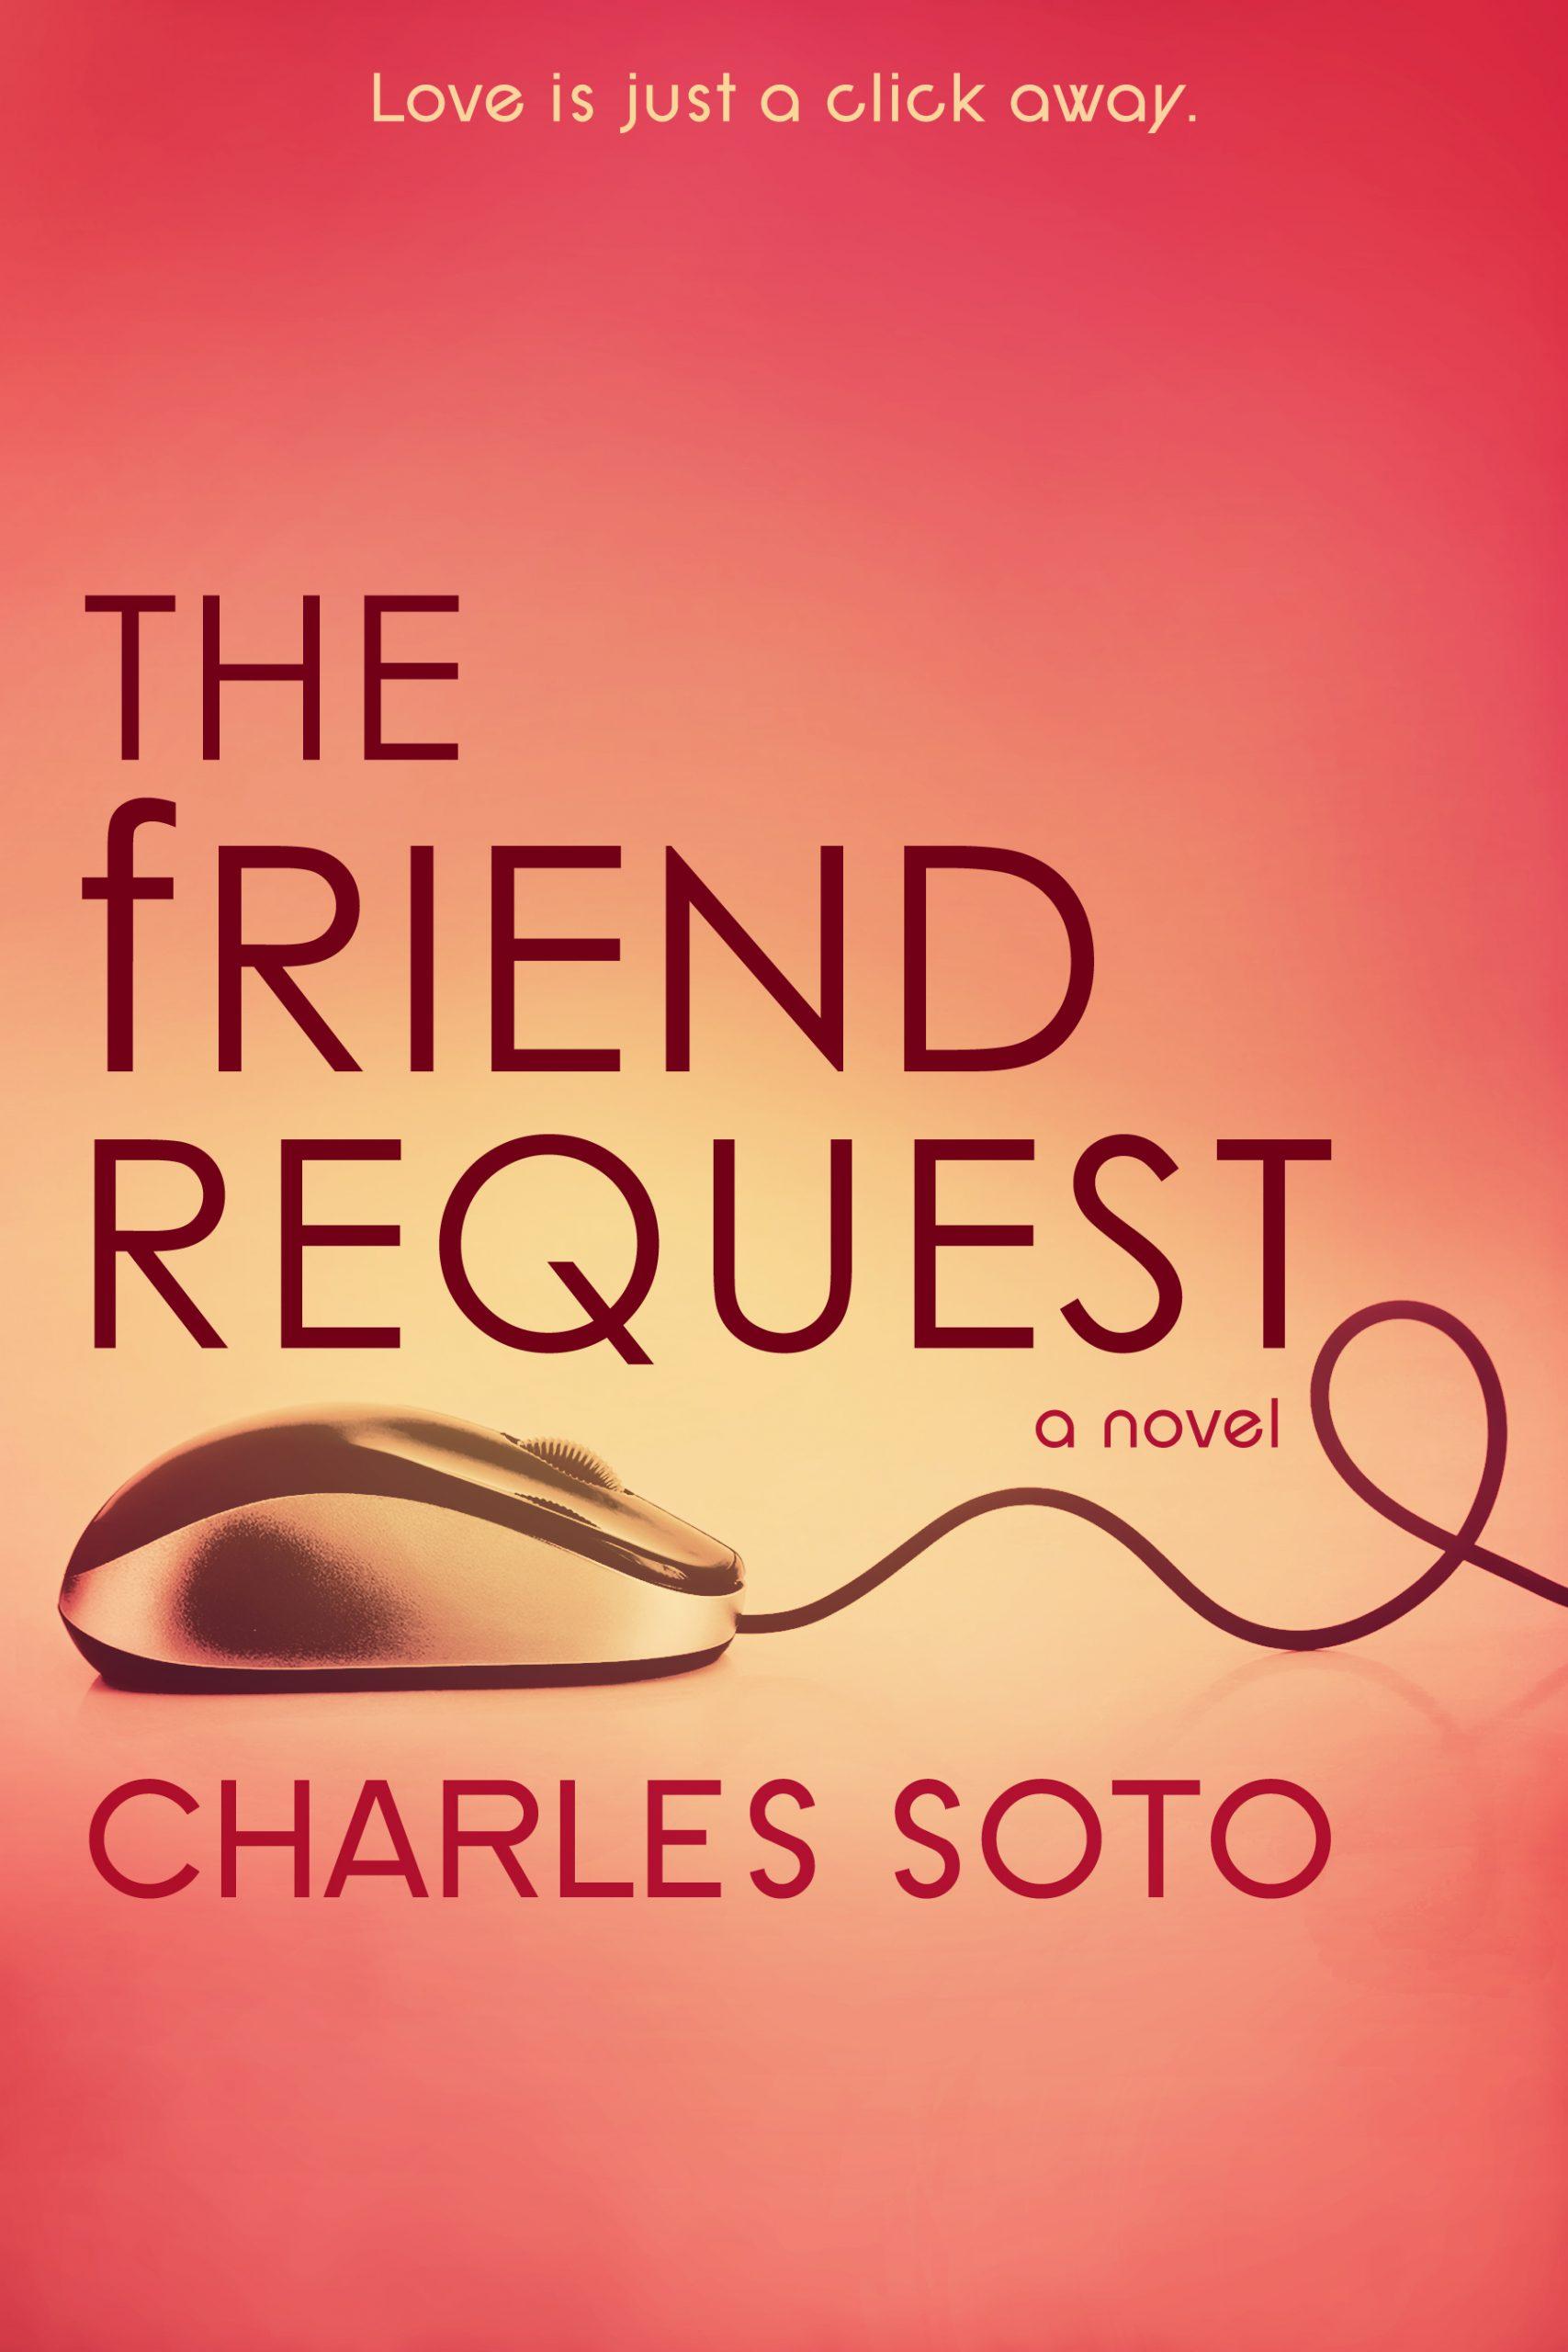 The Friend Request #booktour